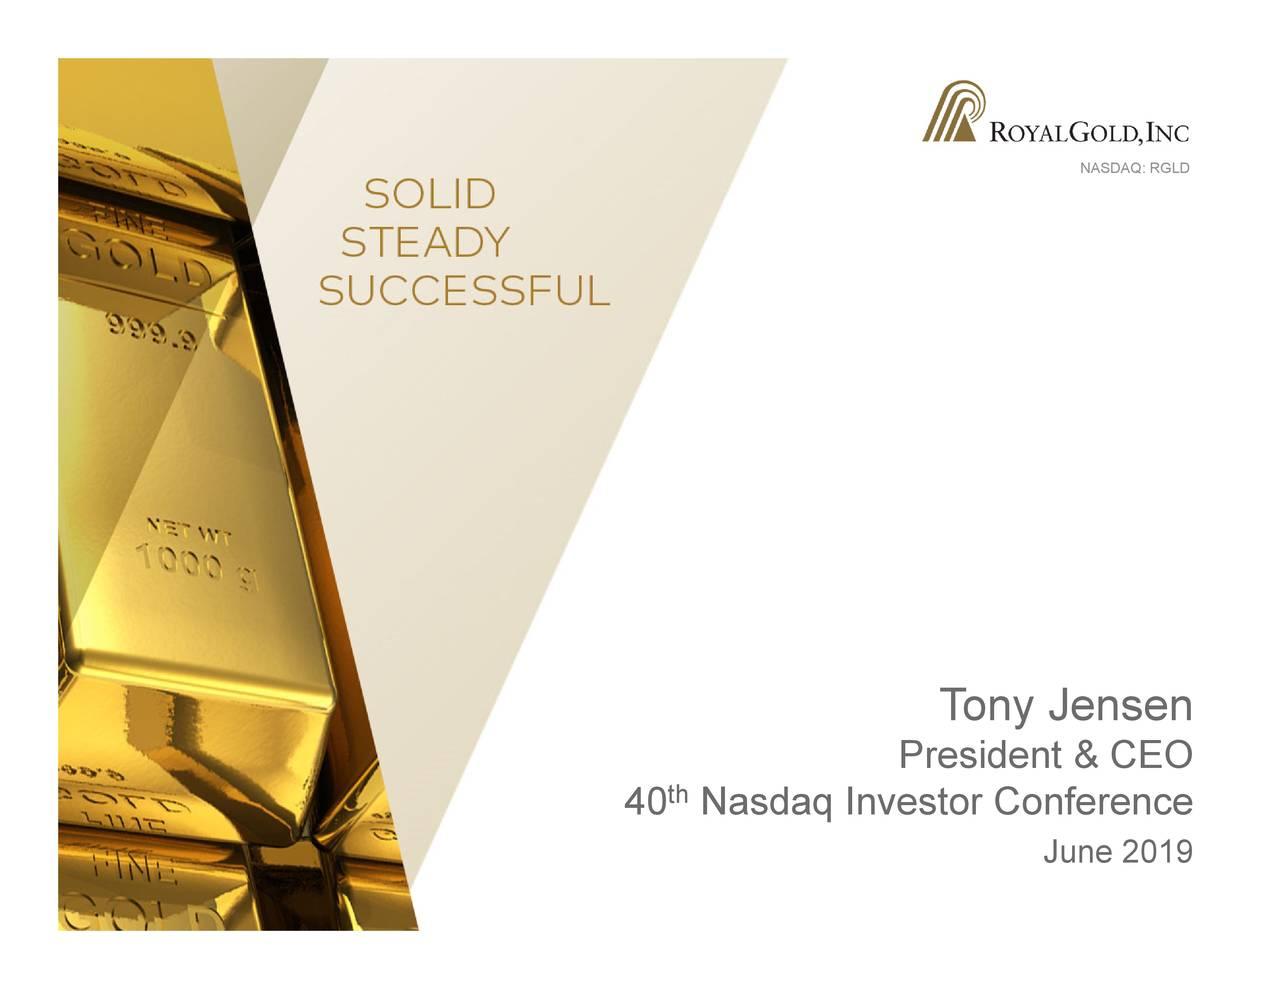 June 2019 Tony Jensen President & CEO Nasdaq Investor Conference th 40